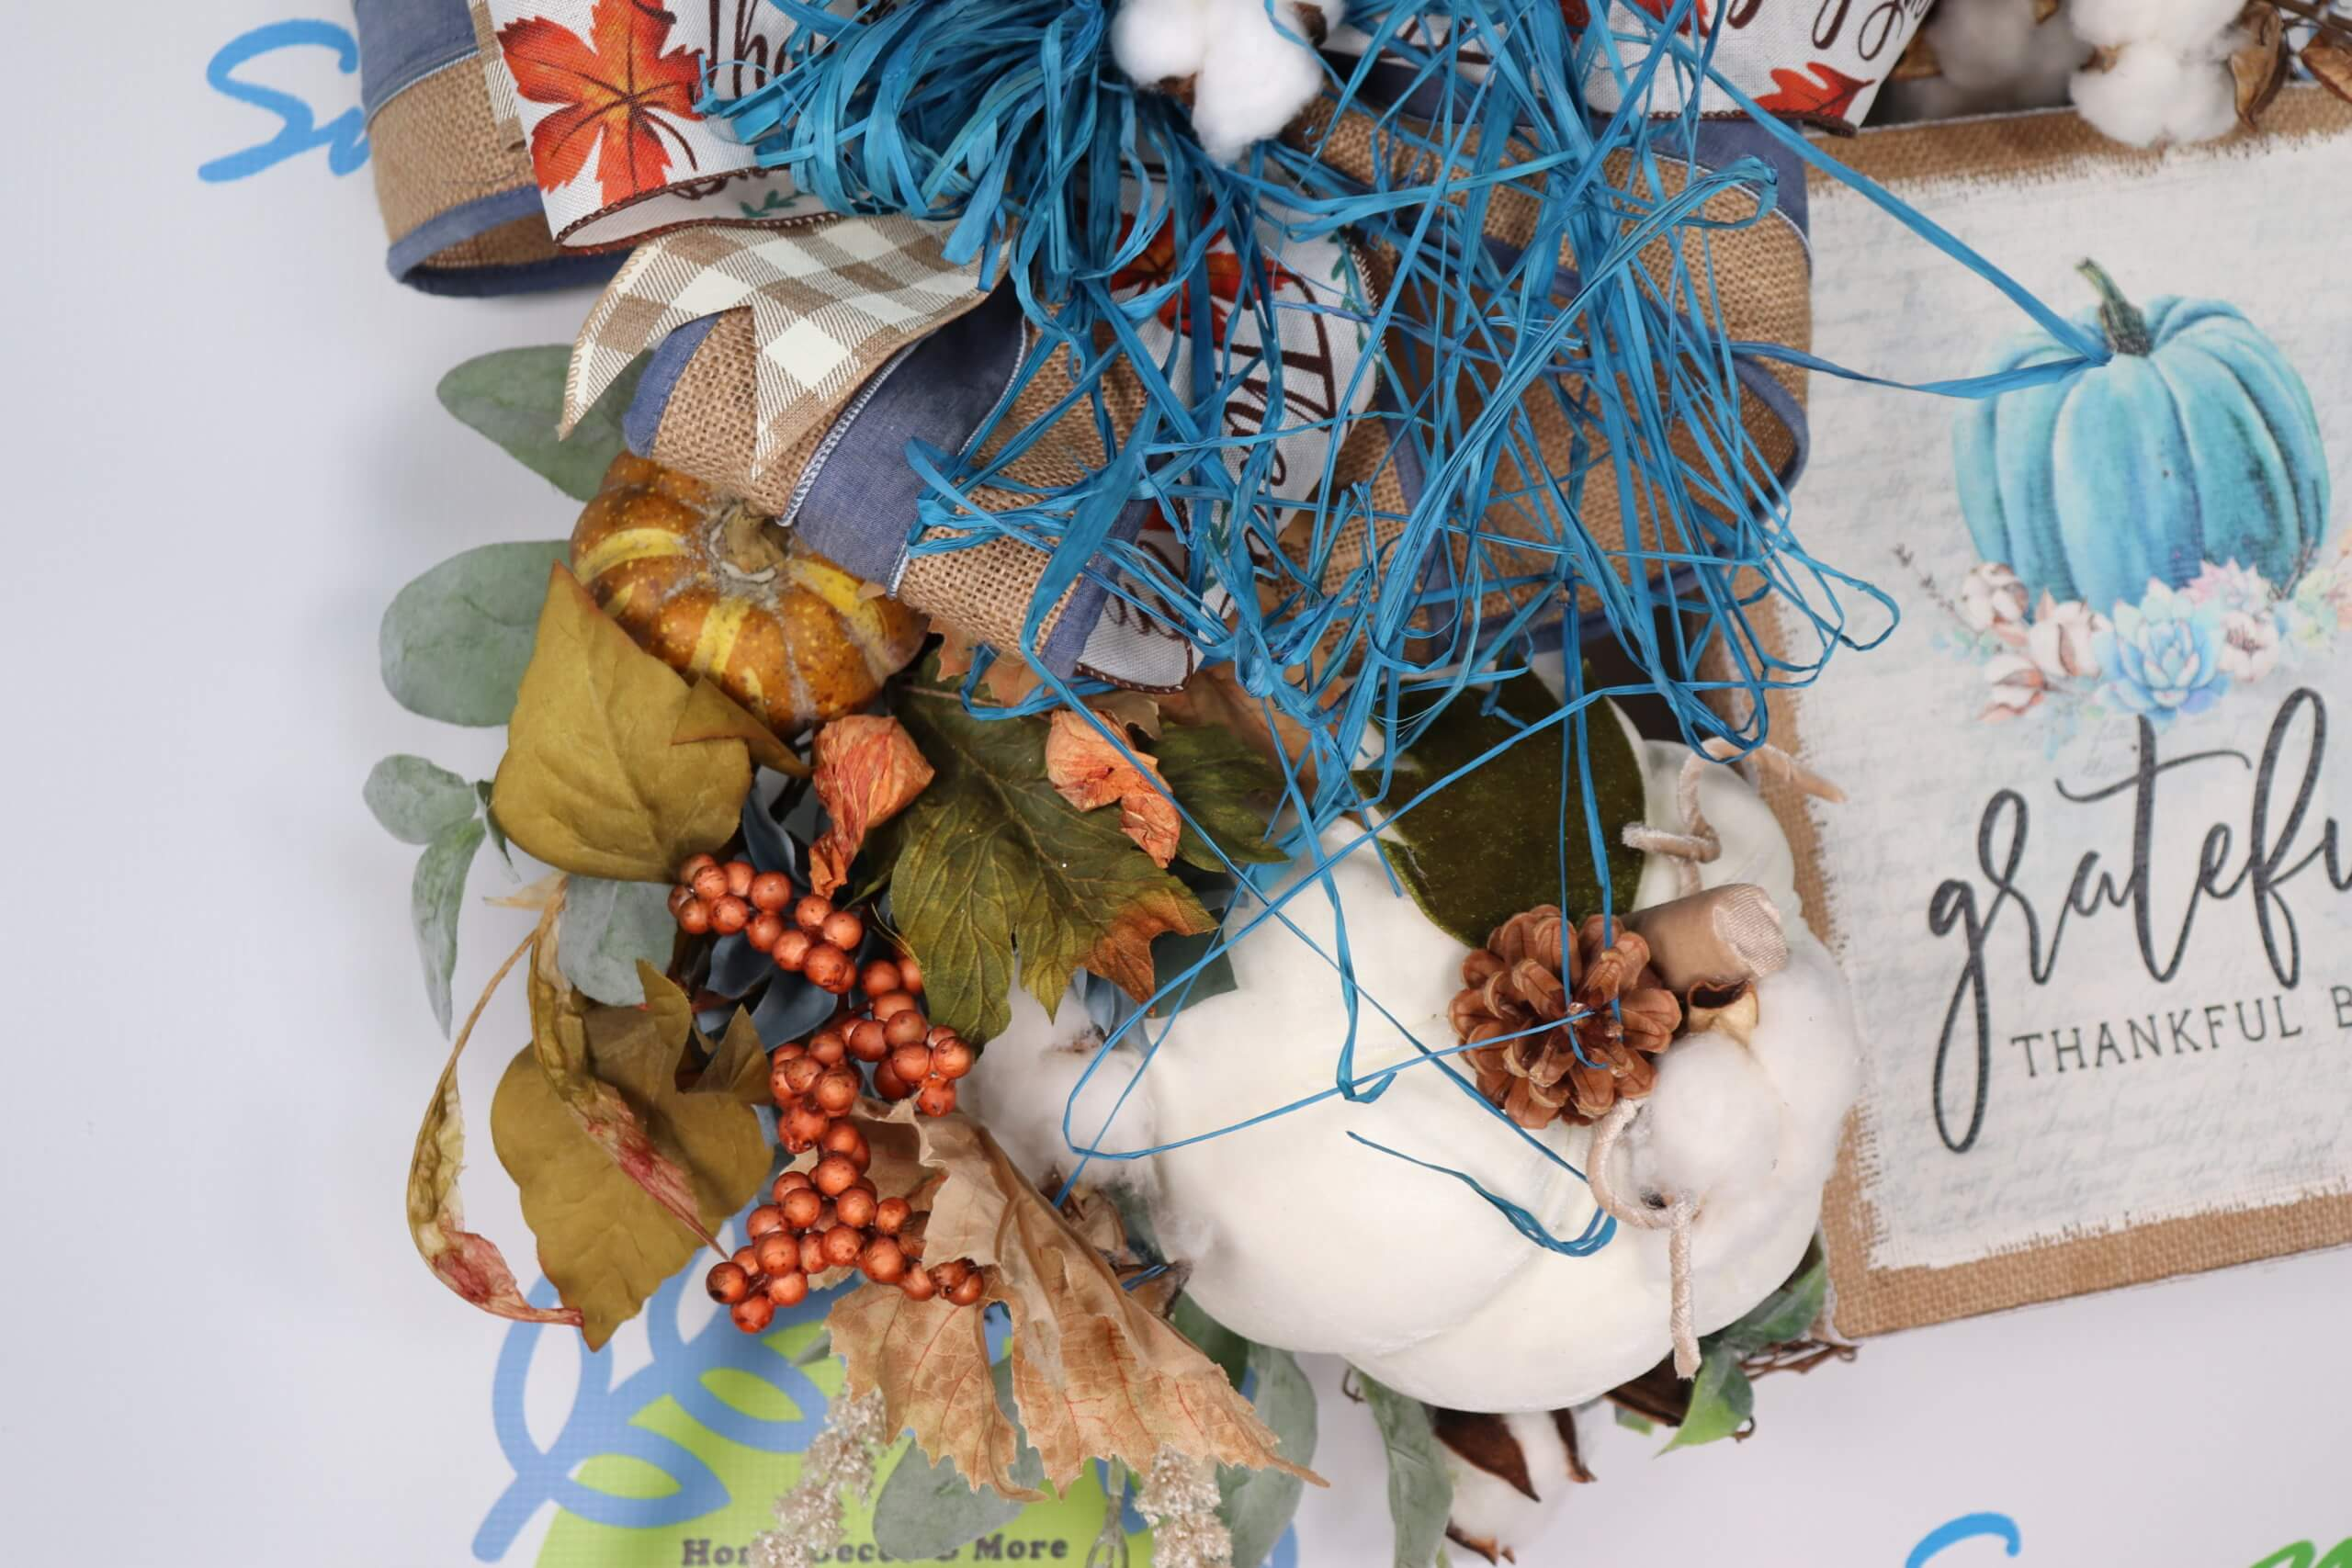 Fall Wreath Grateful Thankful Blessed Blue Pumpkin Swaym E Vegas